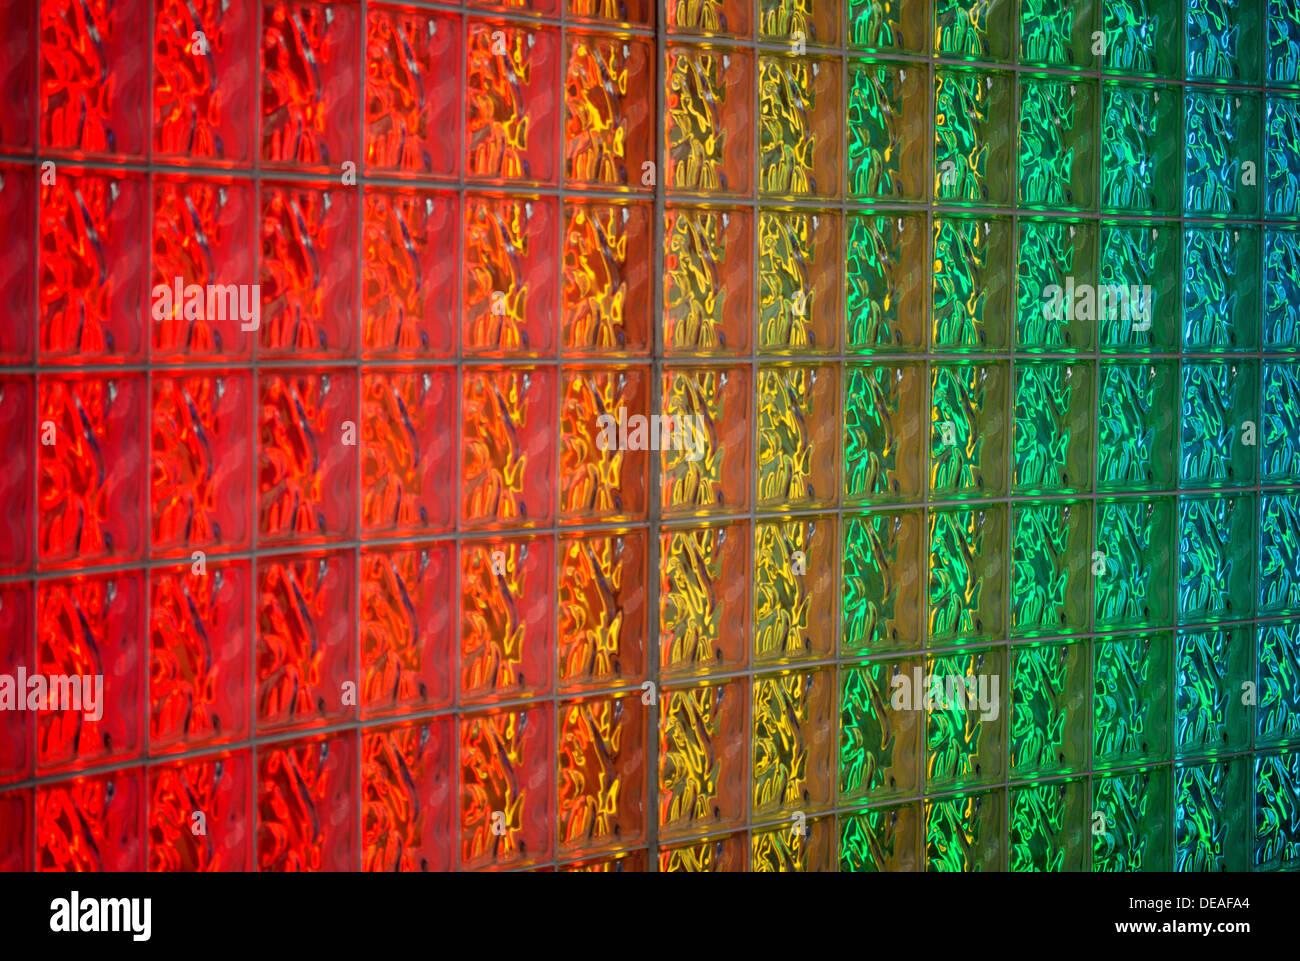 Neon Rainbow Colors Stock Photos & Neon Rainbow Colors Stock Images ...